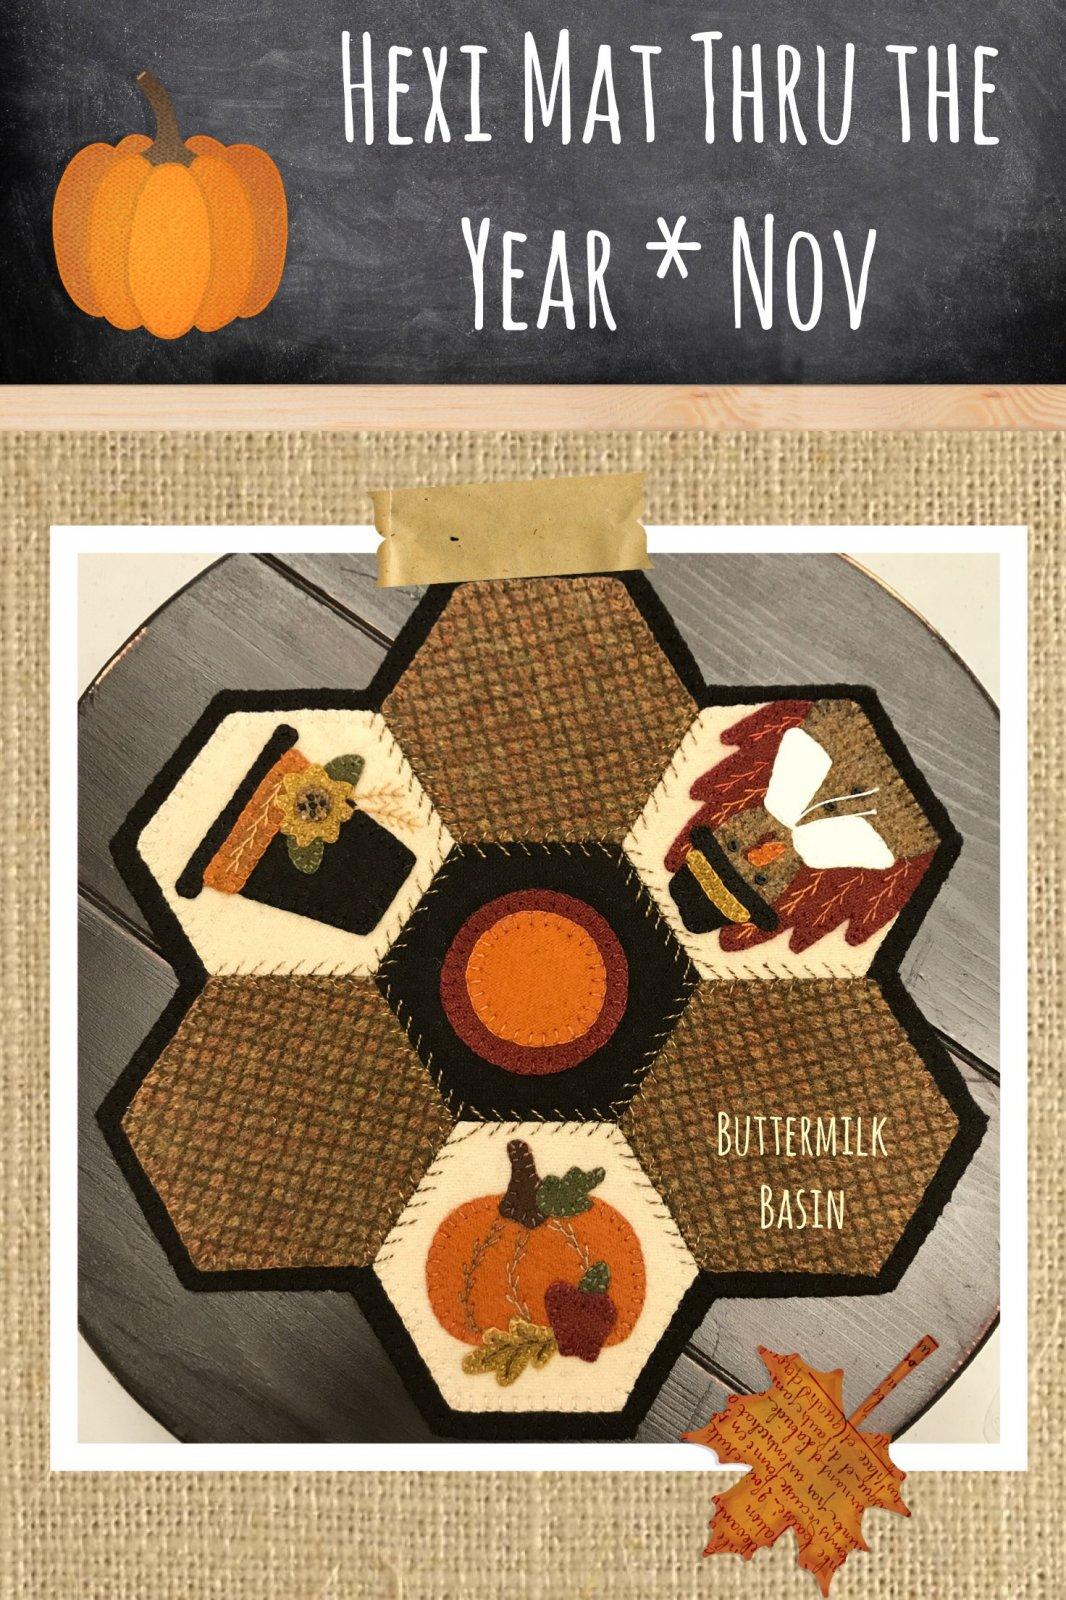 Hexi Mats thru the Year * November KIT & Pattern